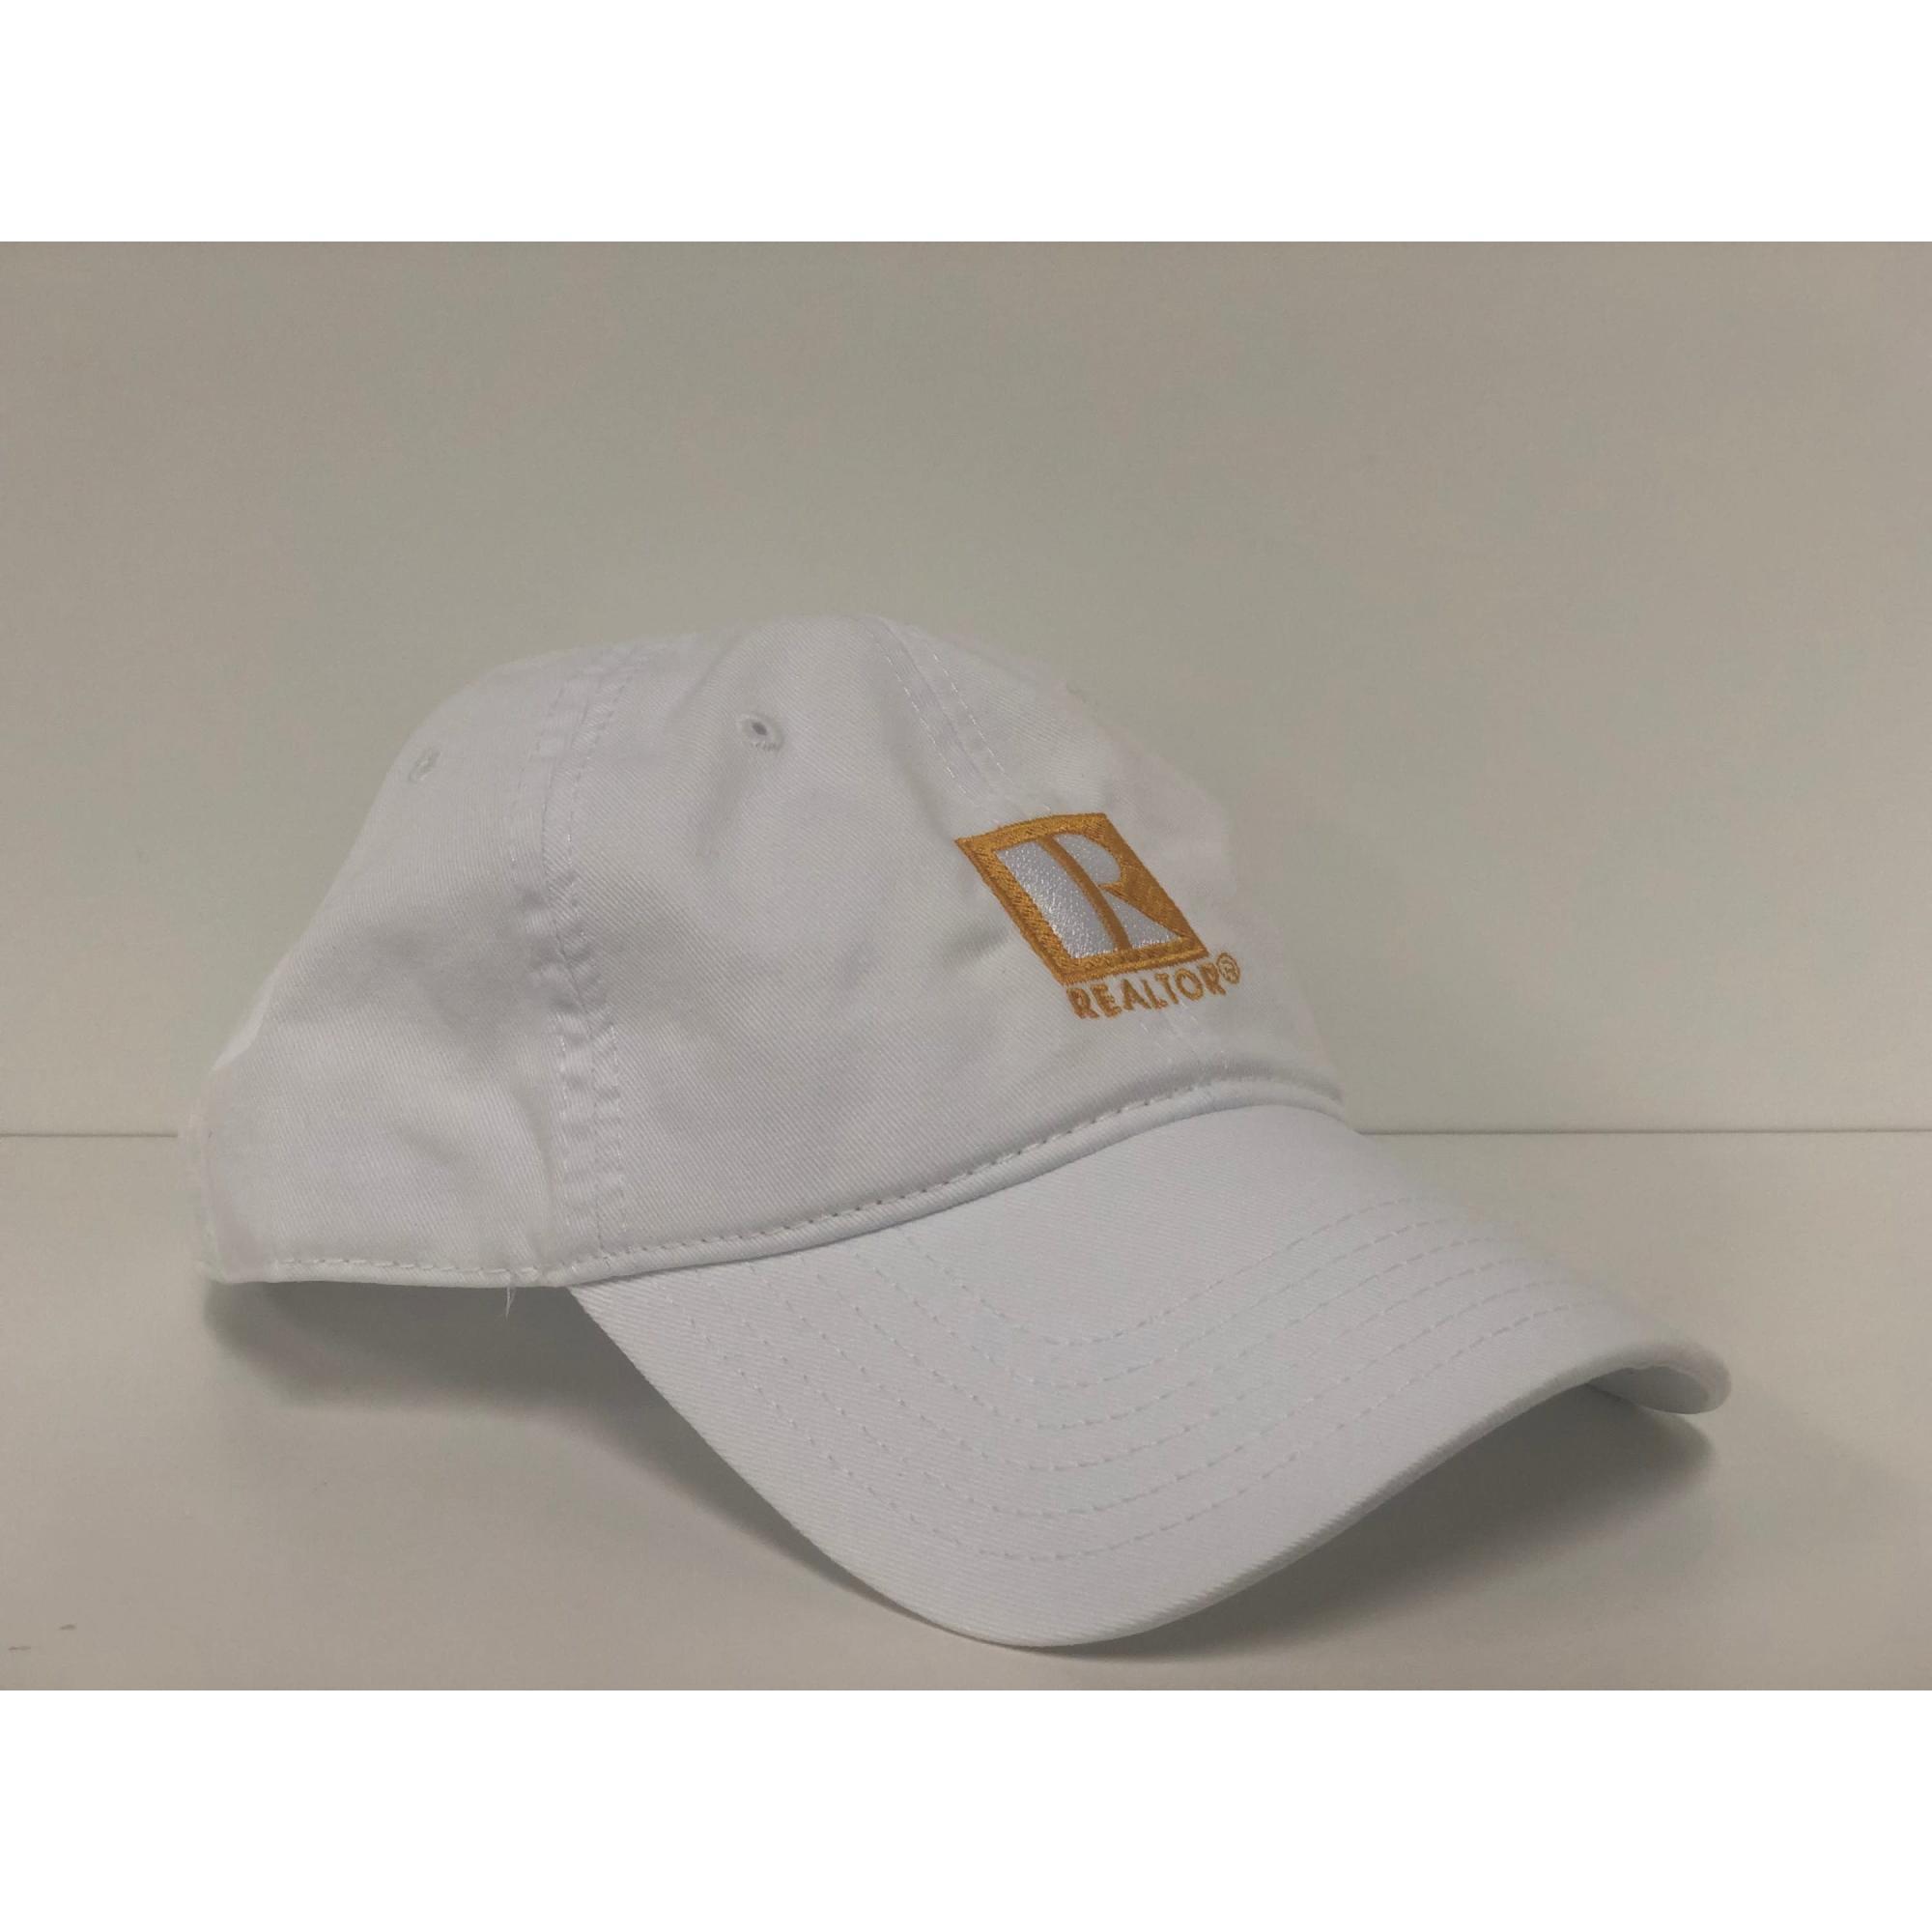 White REALTOR® Ball Cap provided by WCREALTORS®